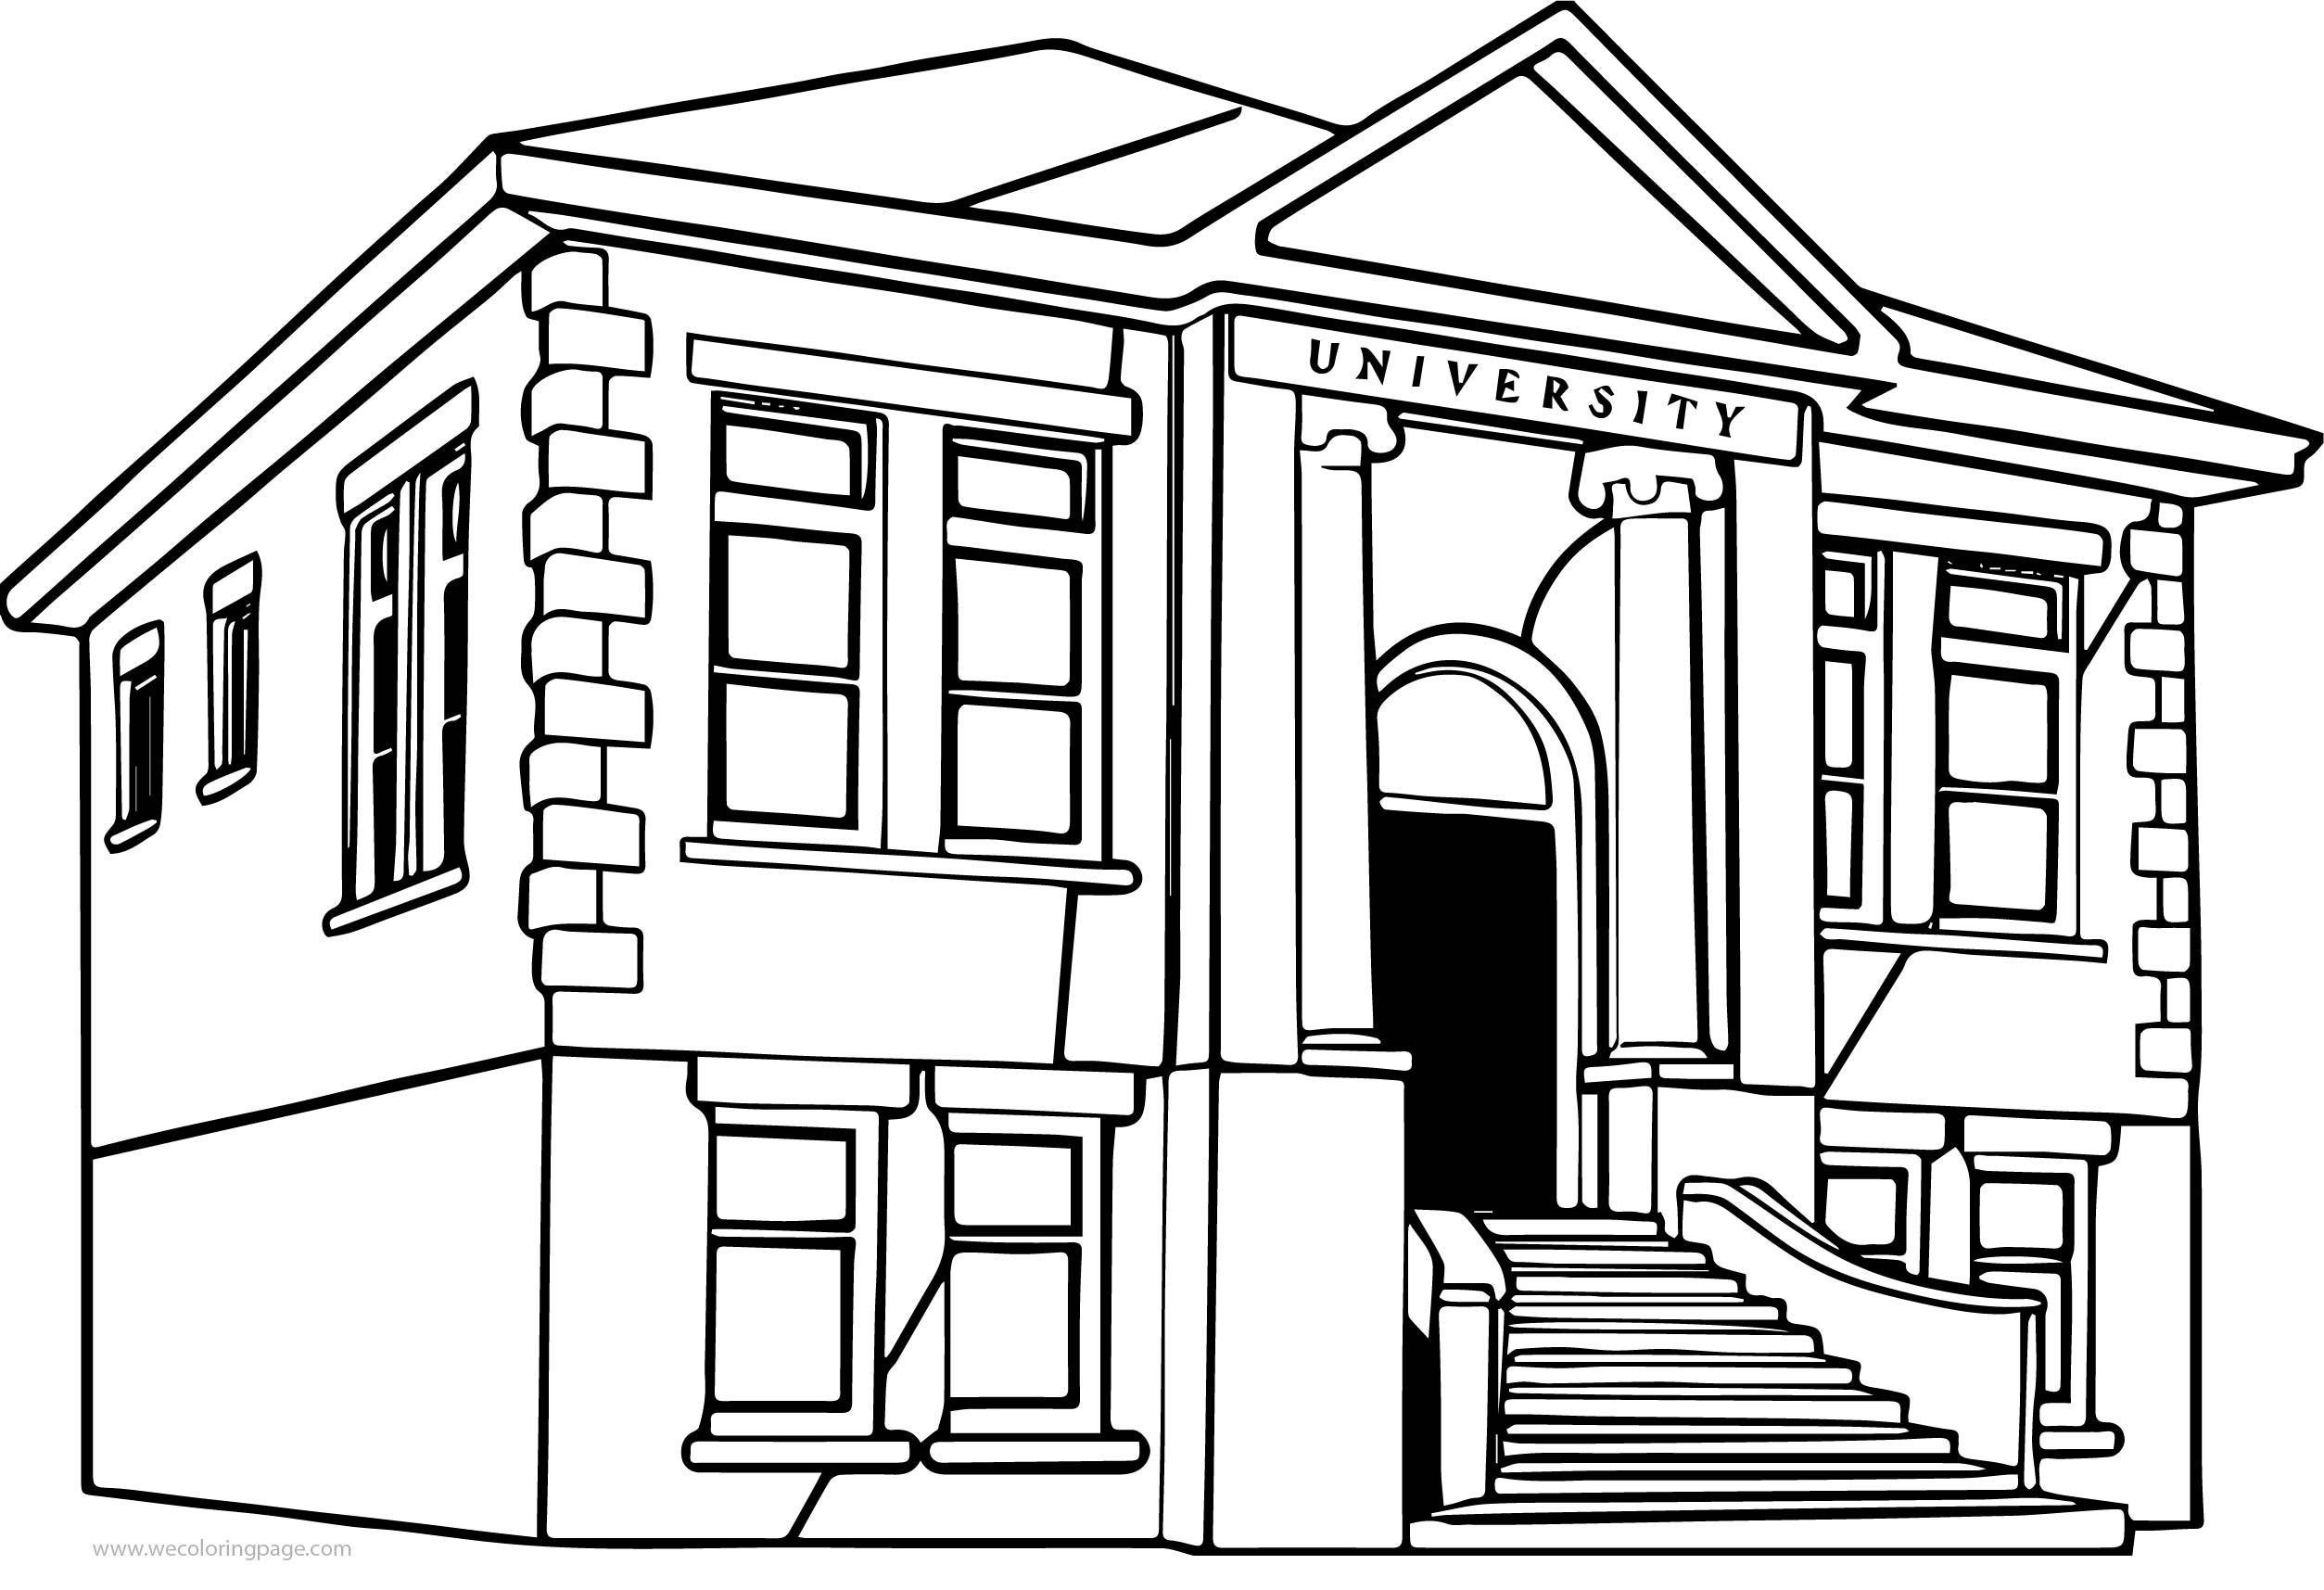 University Coloring Page Wecoloringpage Com